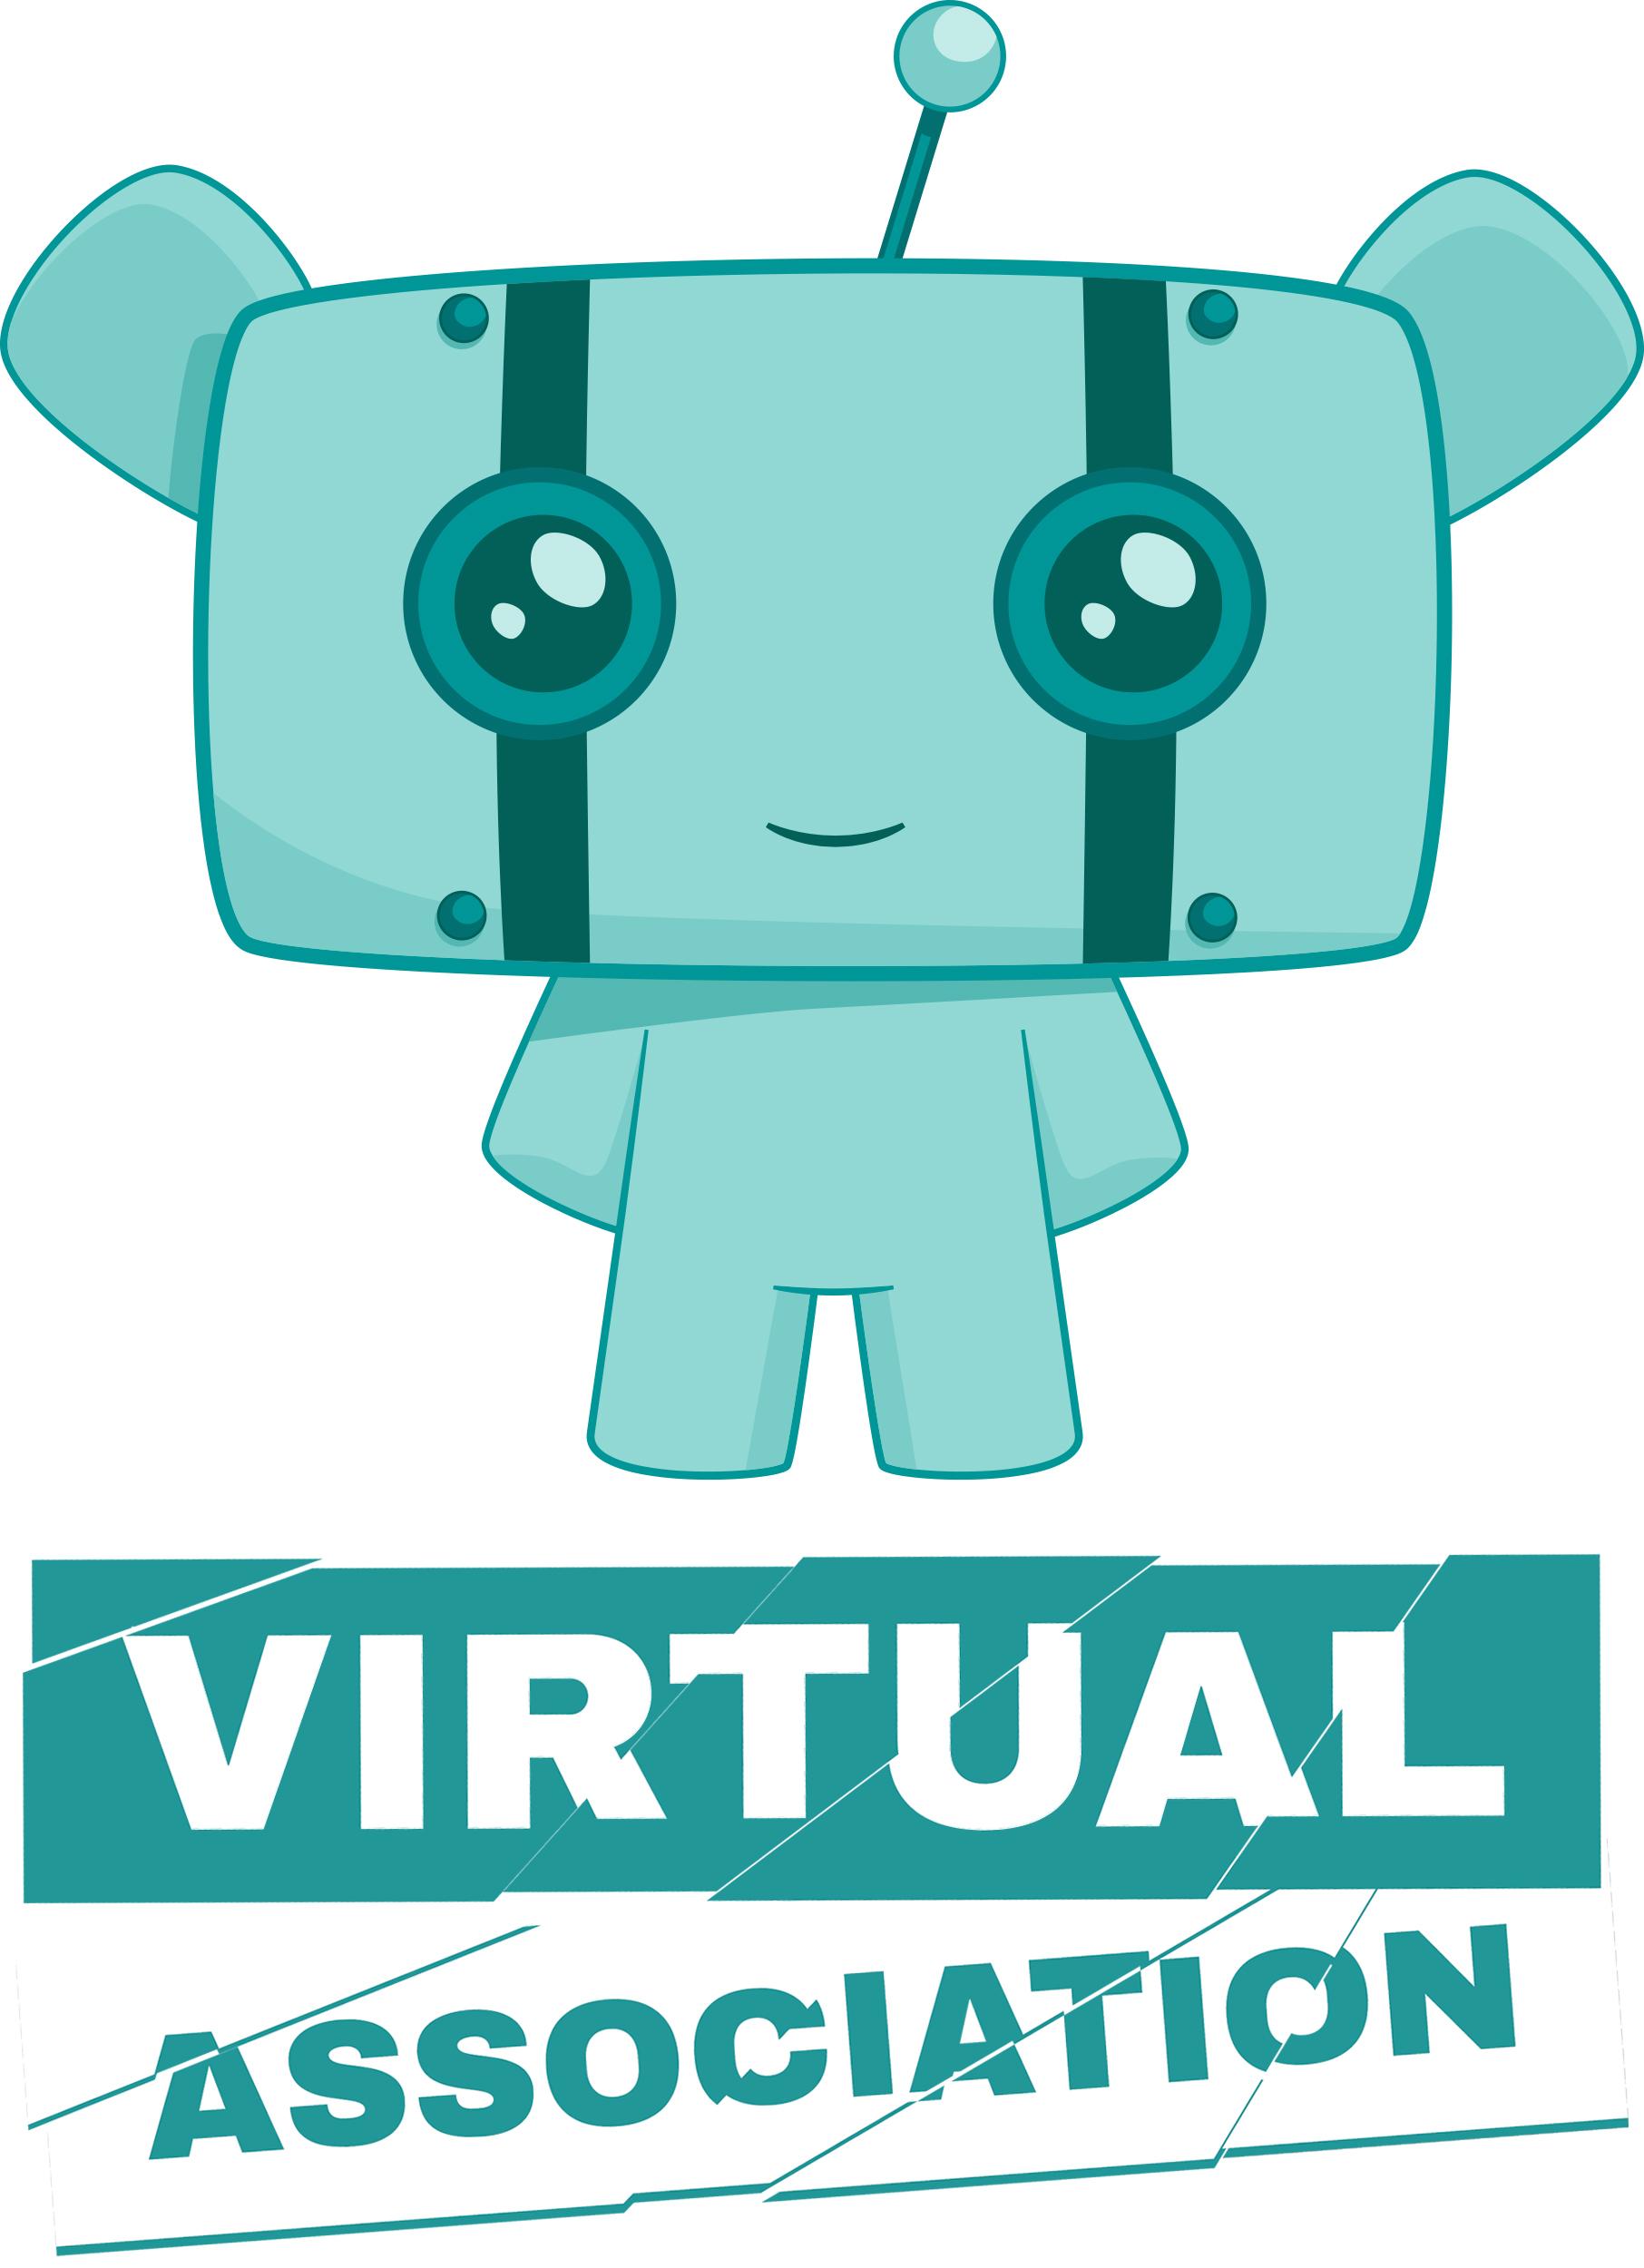 Virtual Association